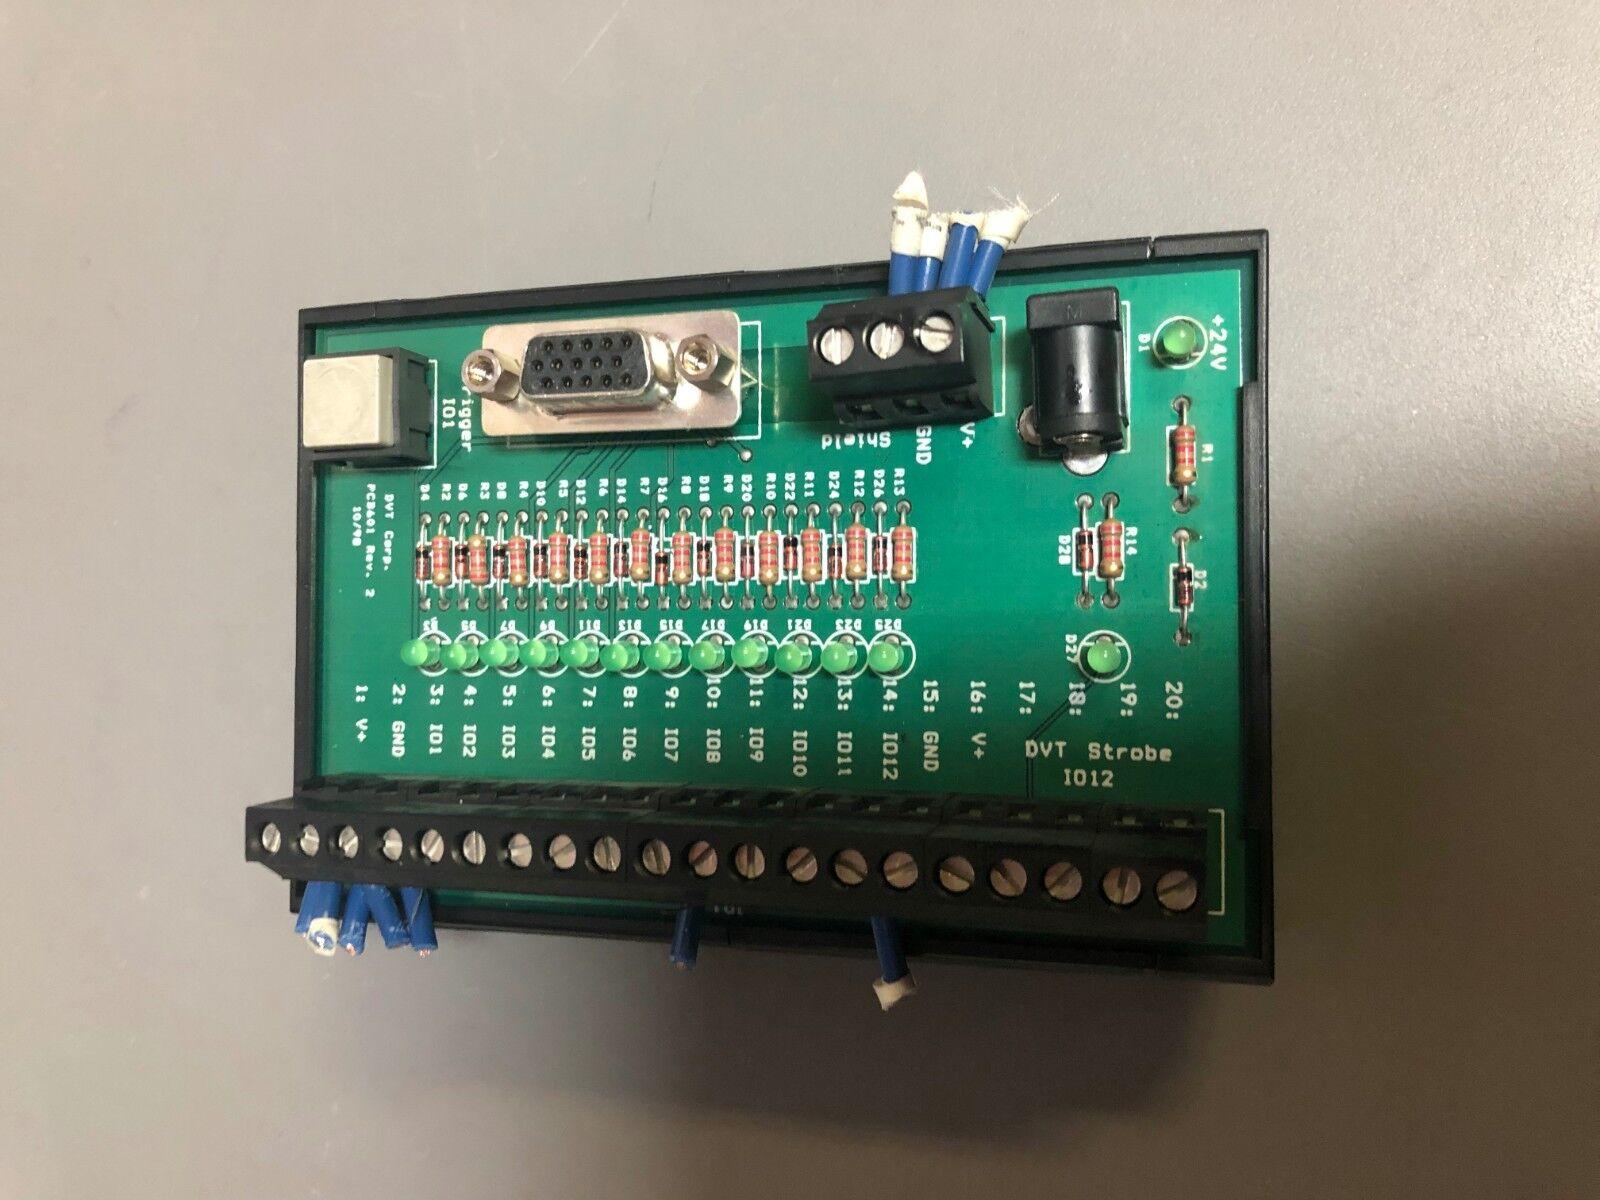 DVT PCB601 Rev 2 5601696 Break Out Board